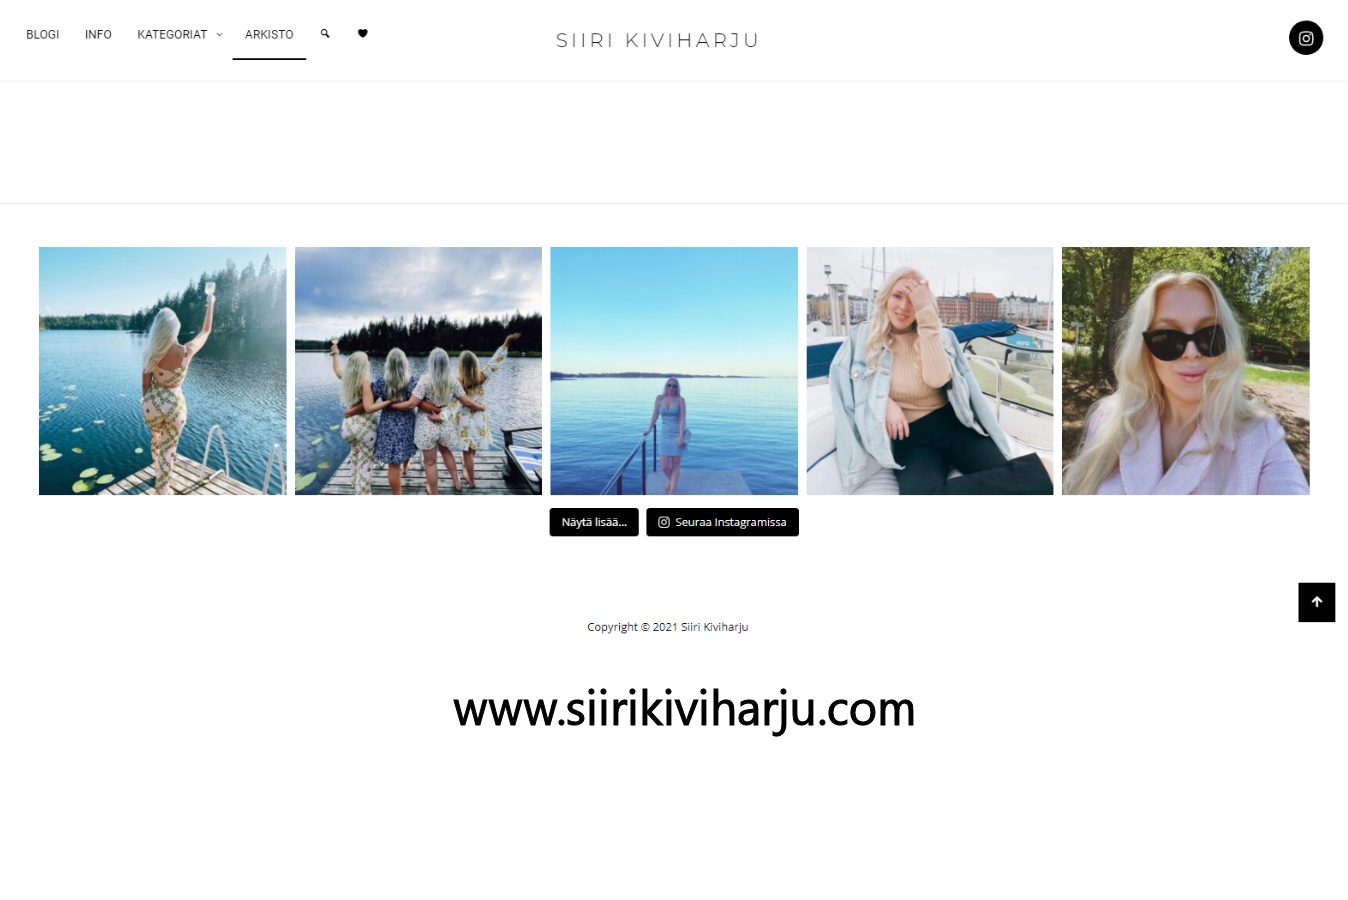 www.siirikiviharju.com